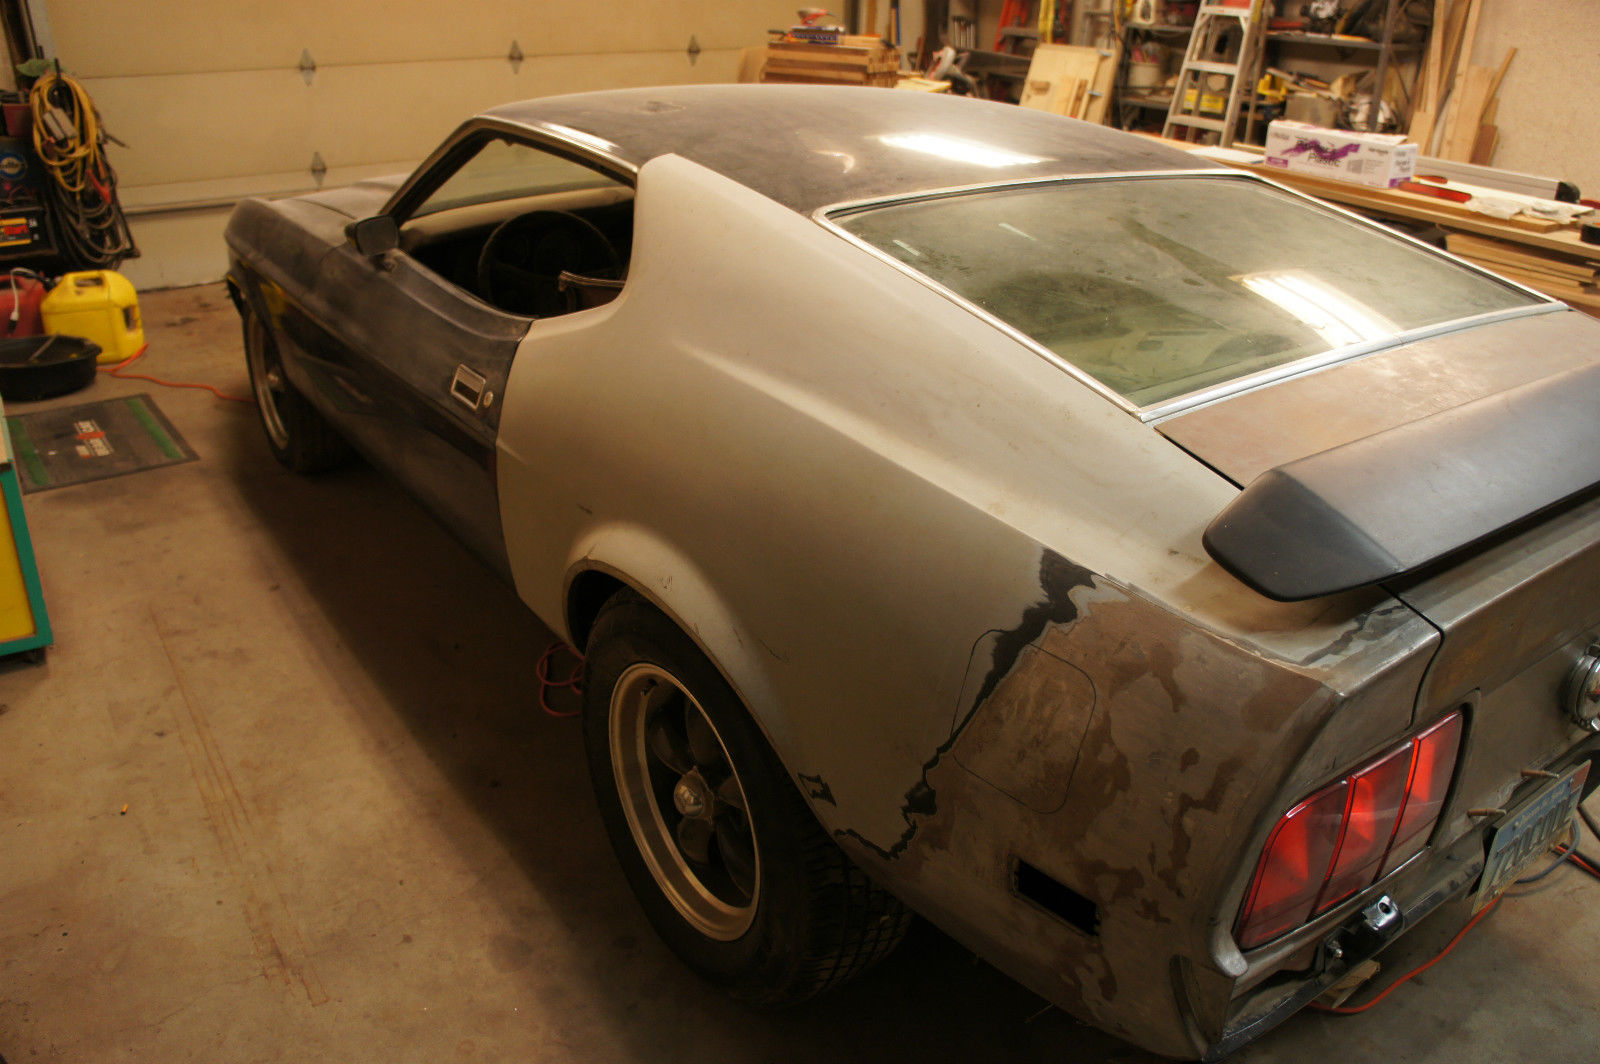 1972 ford mustang q code cobra jet restomod custom project car